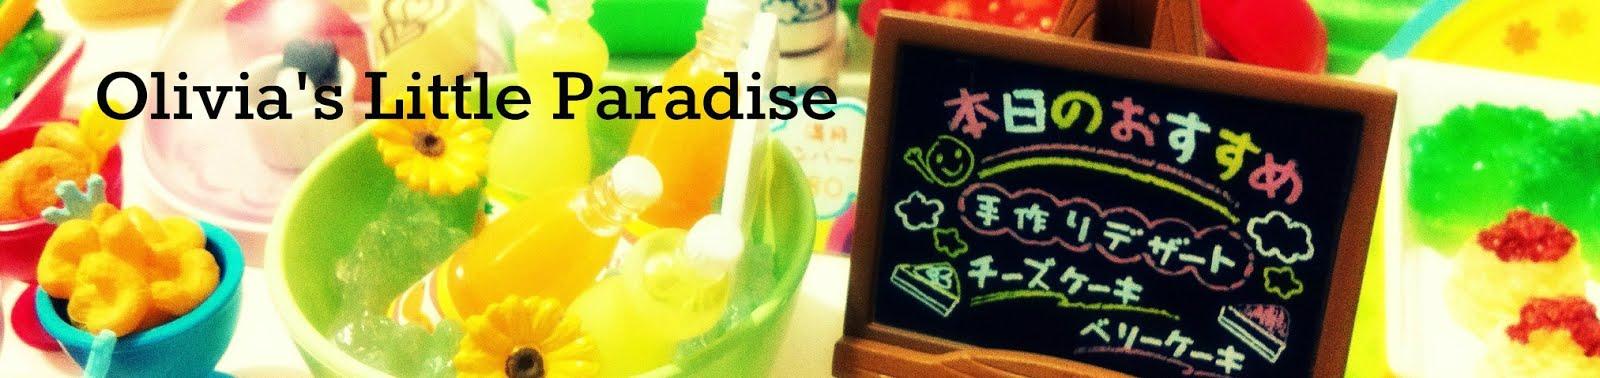 Olivia's Little Paradise